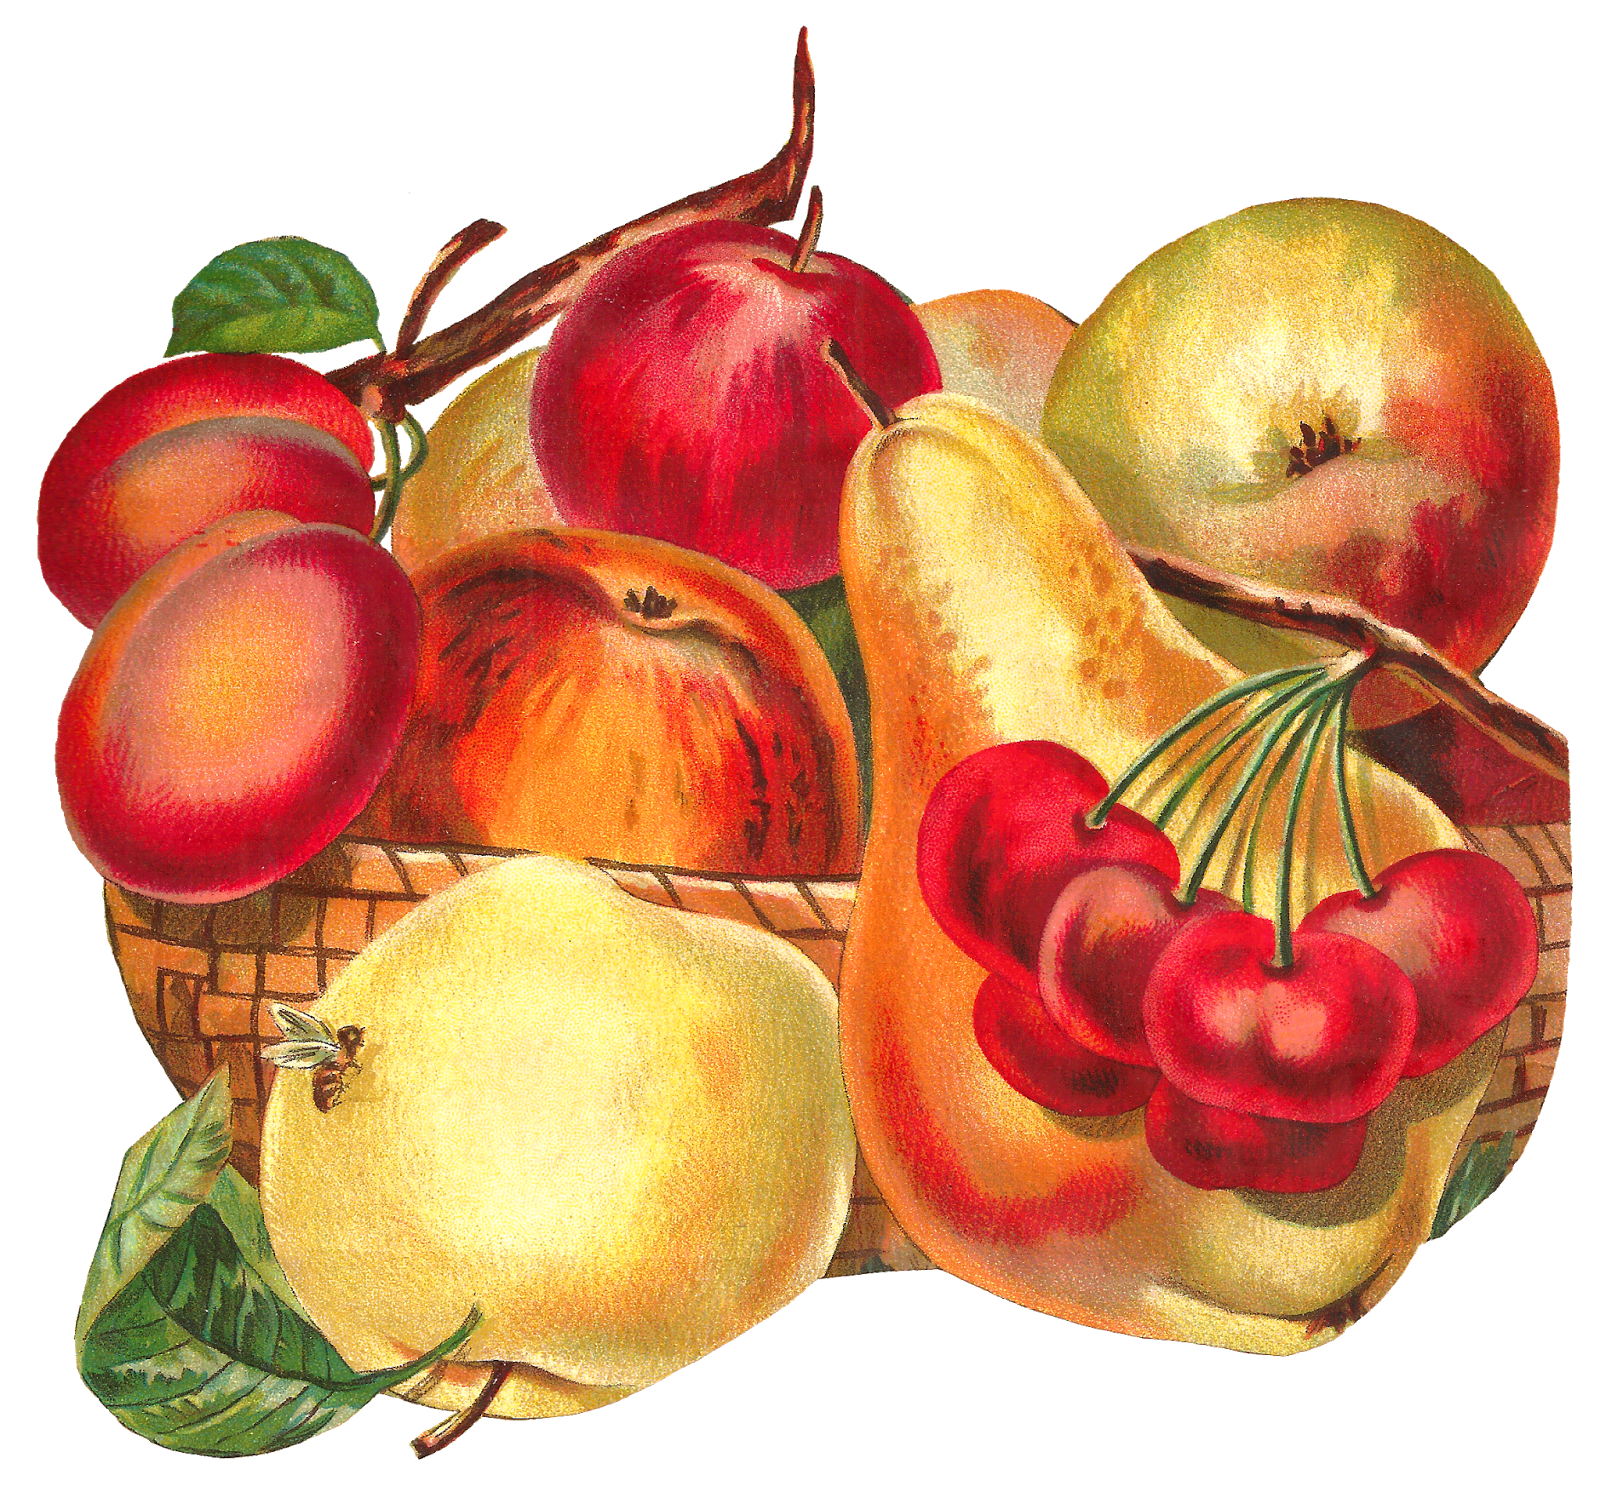 Pear clipart 3 fruit. Antique images basket botanical